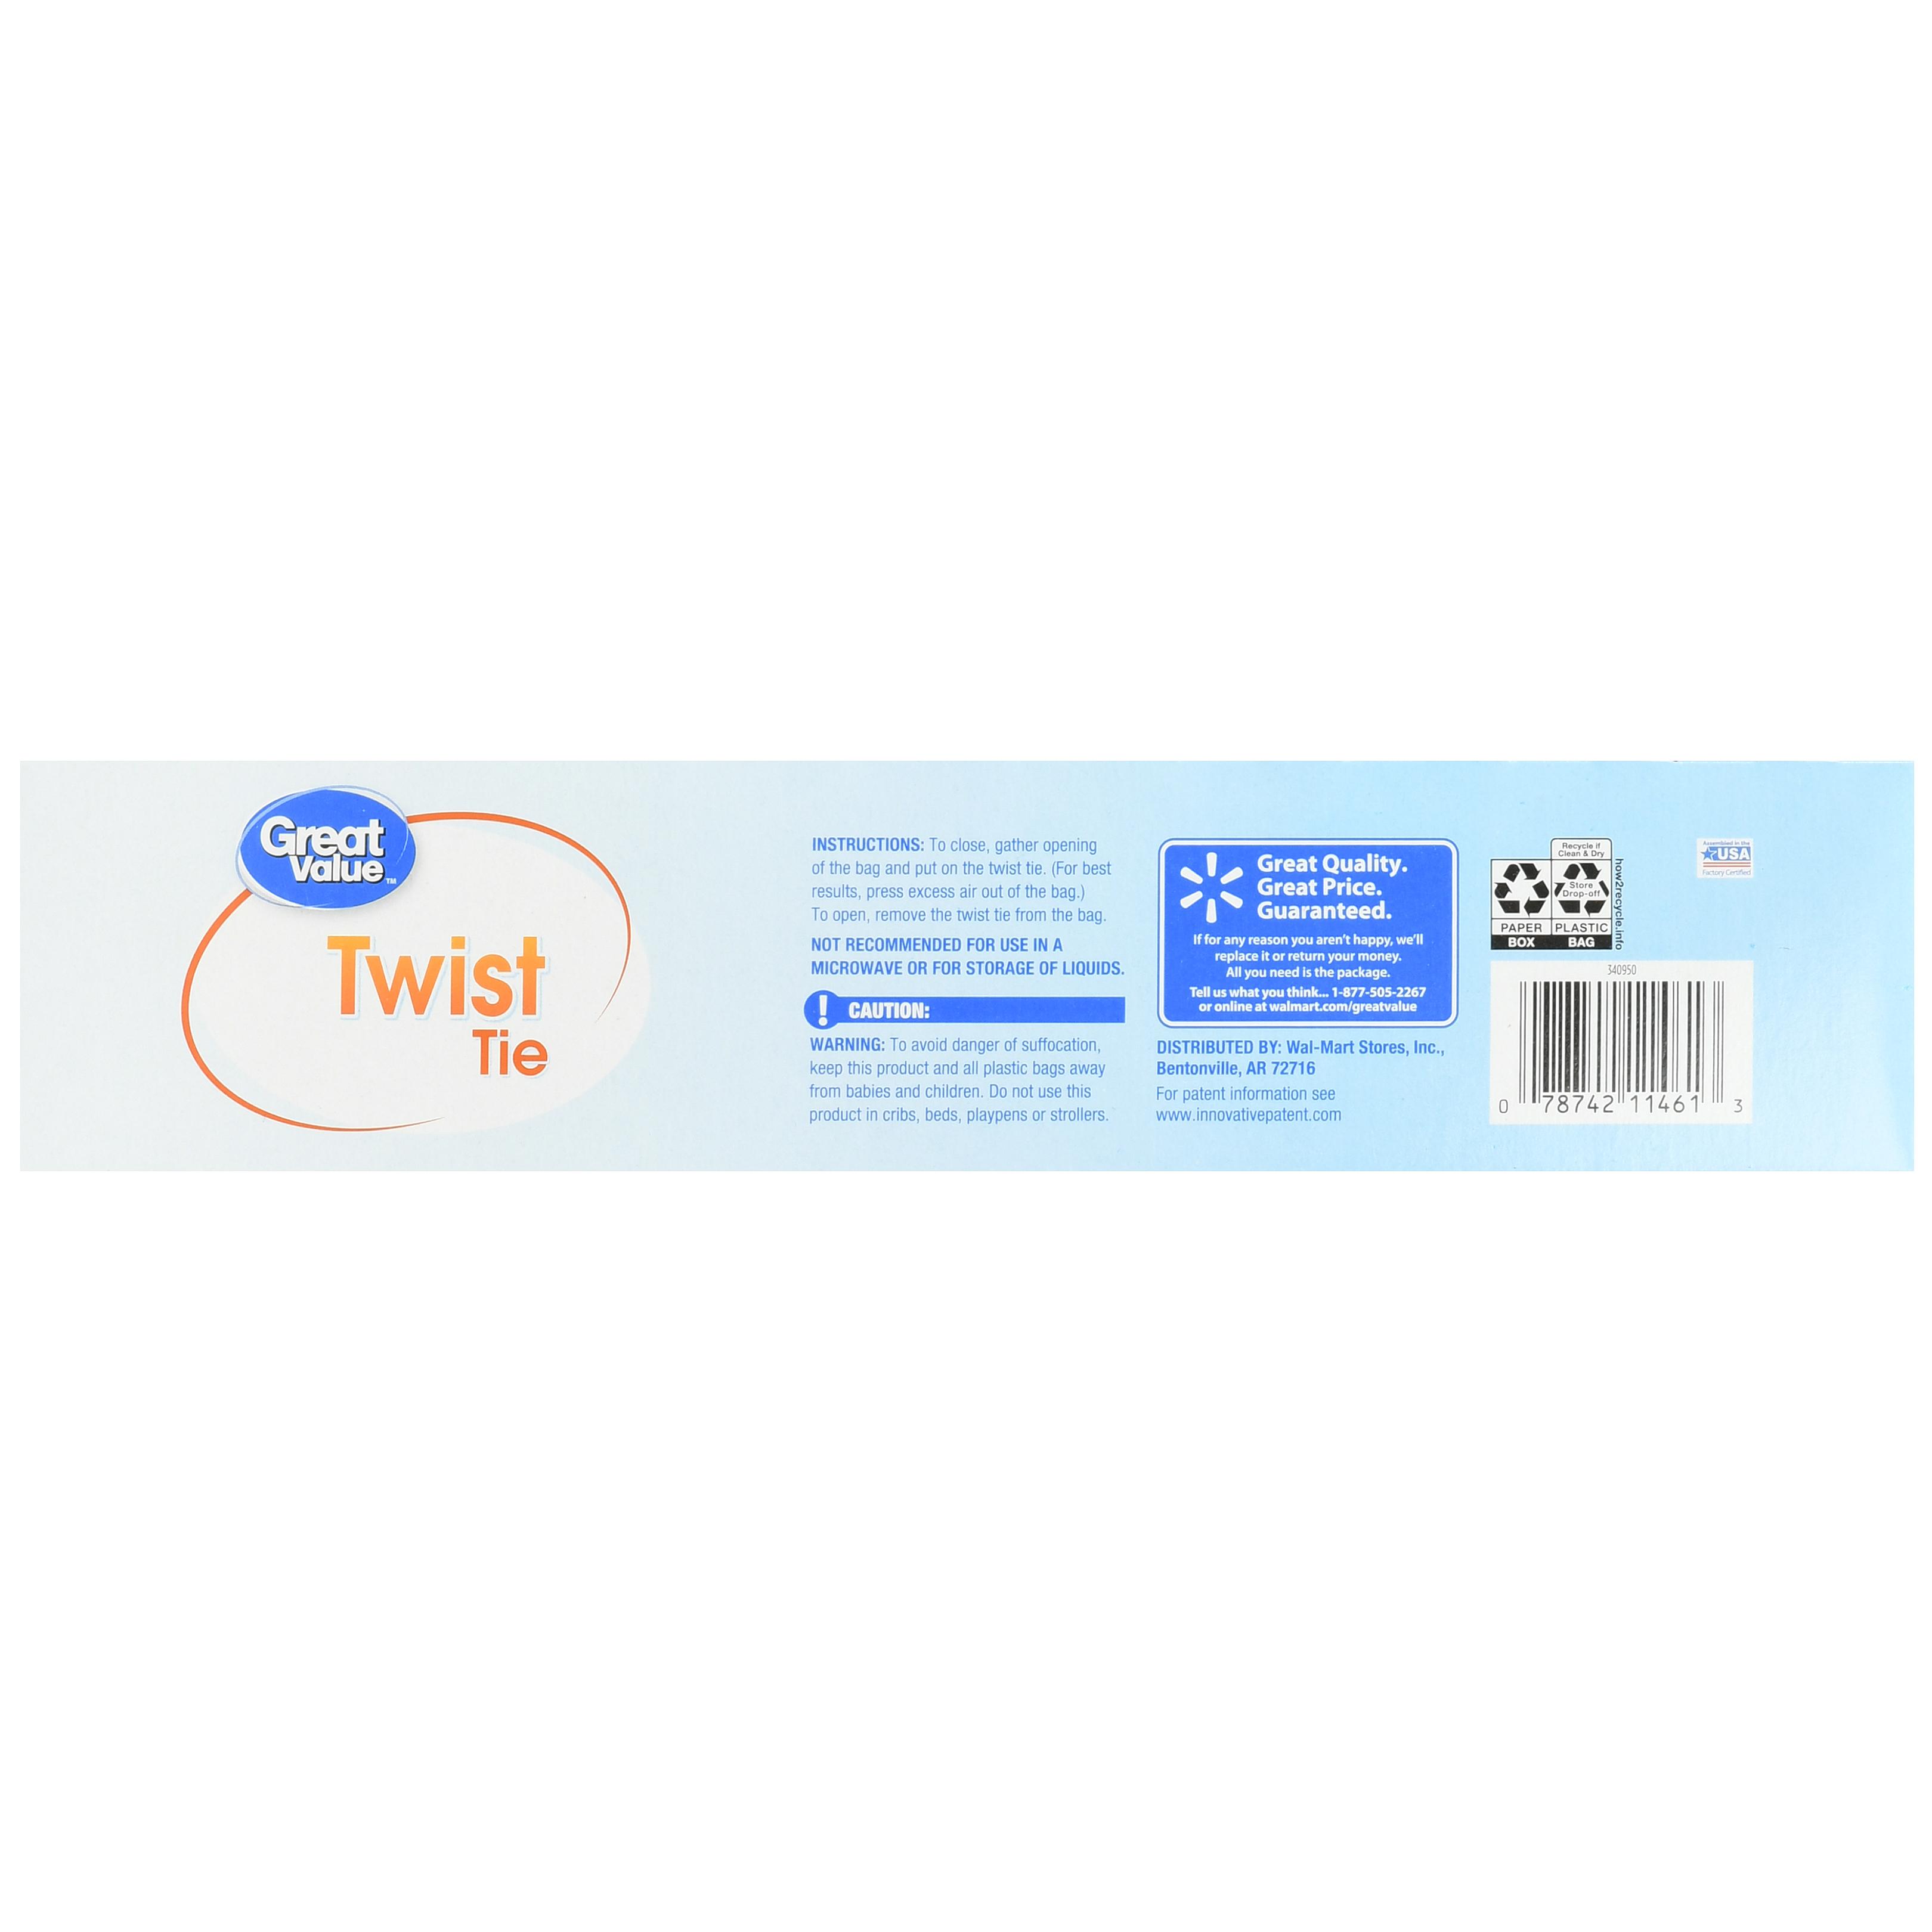 Great Value Twist Tie Storage Bags, Gallon, 100 Count